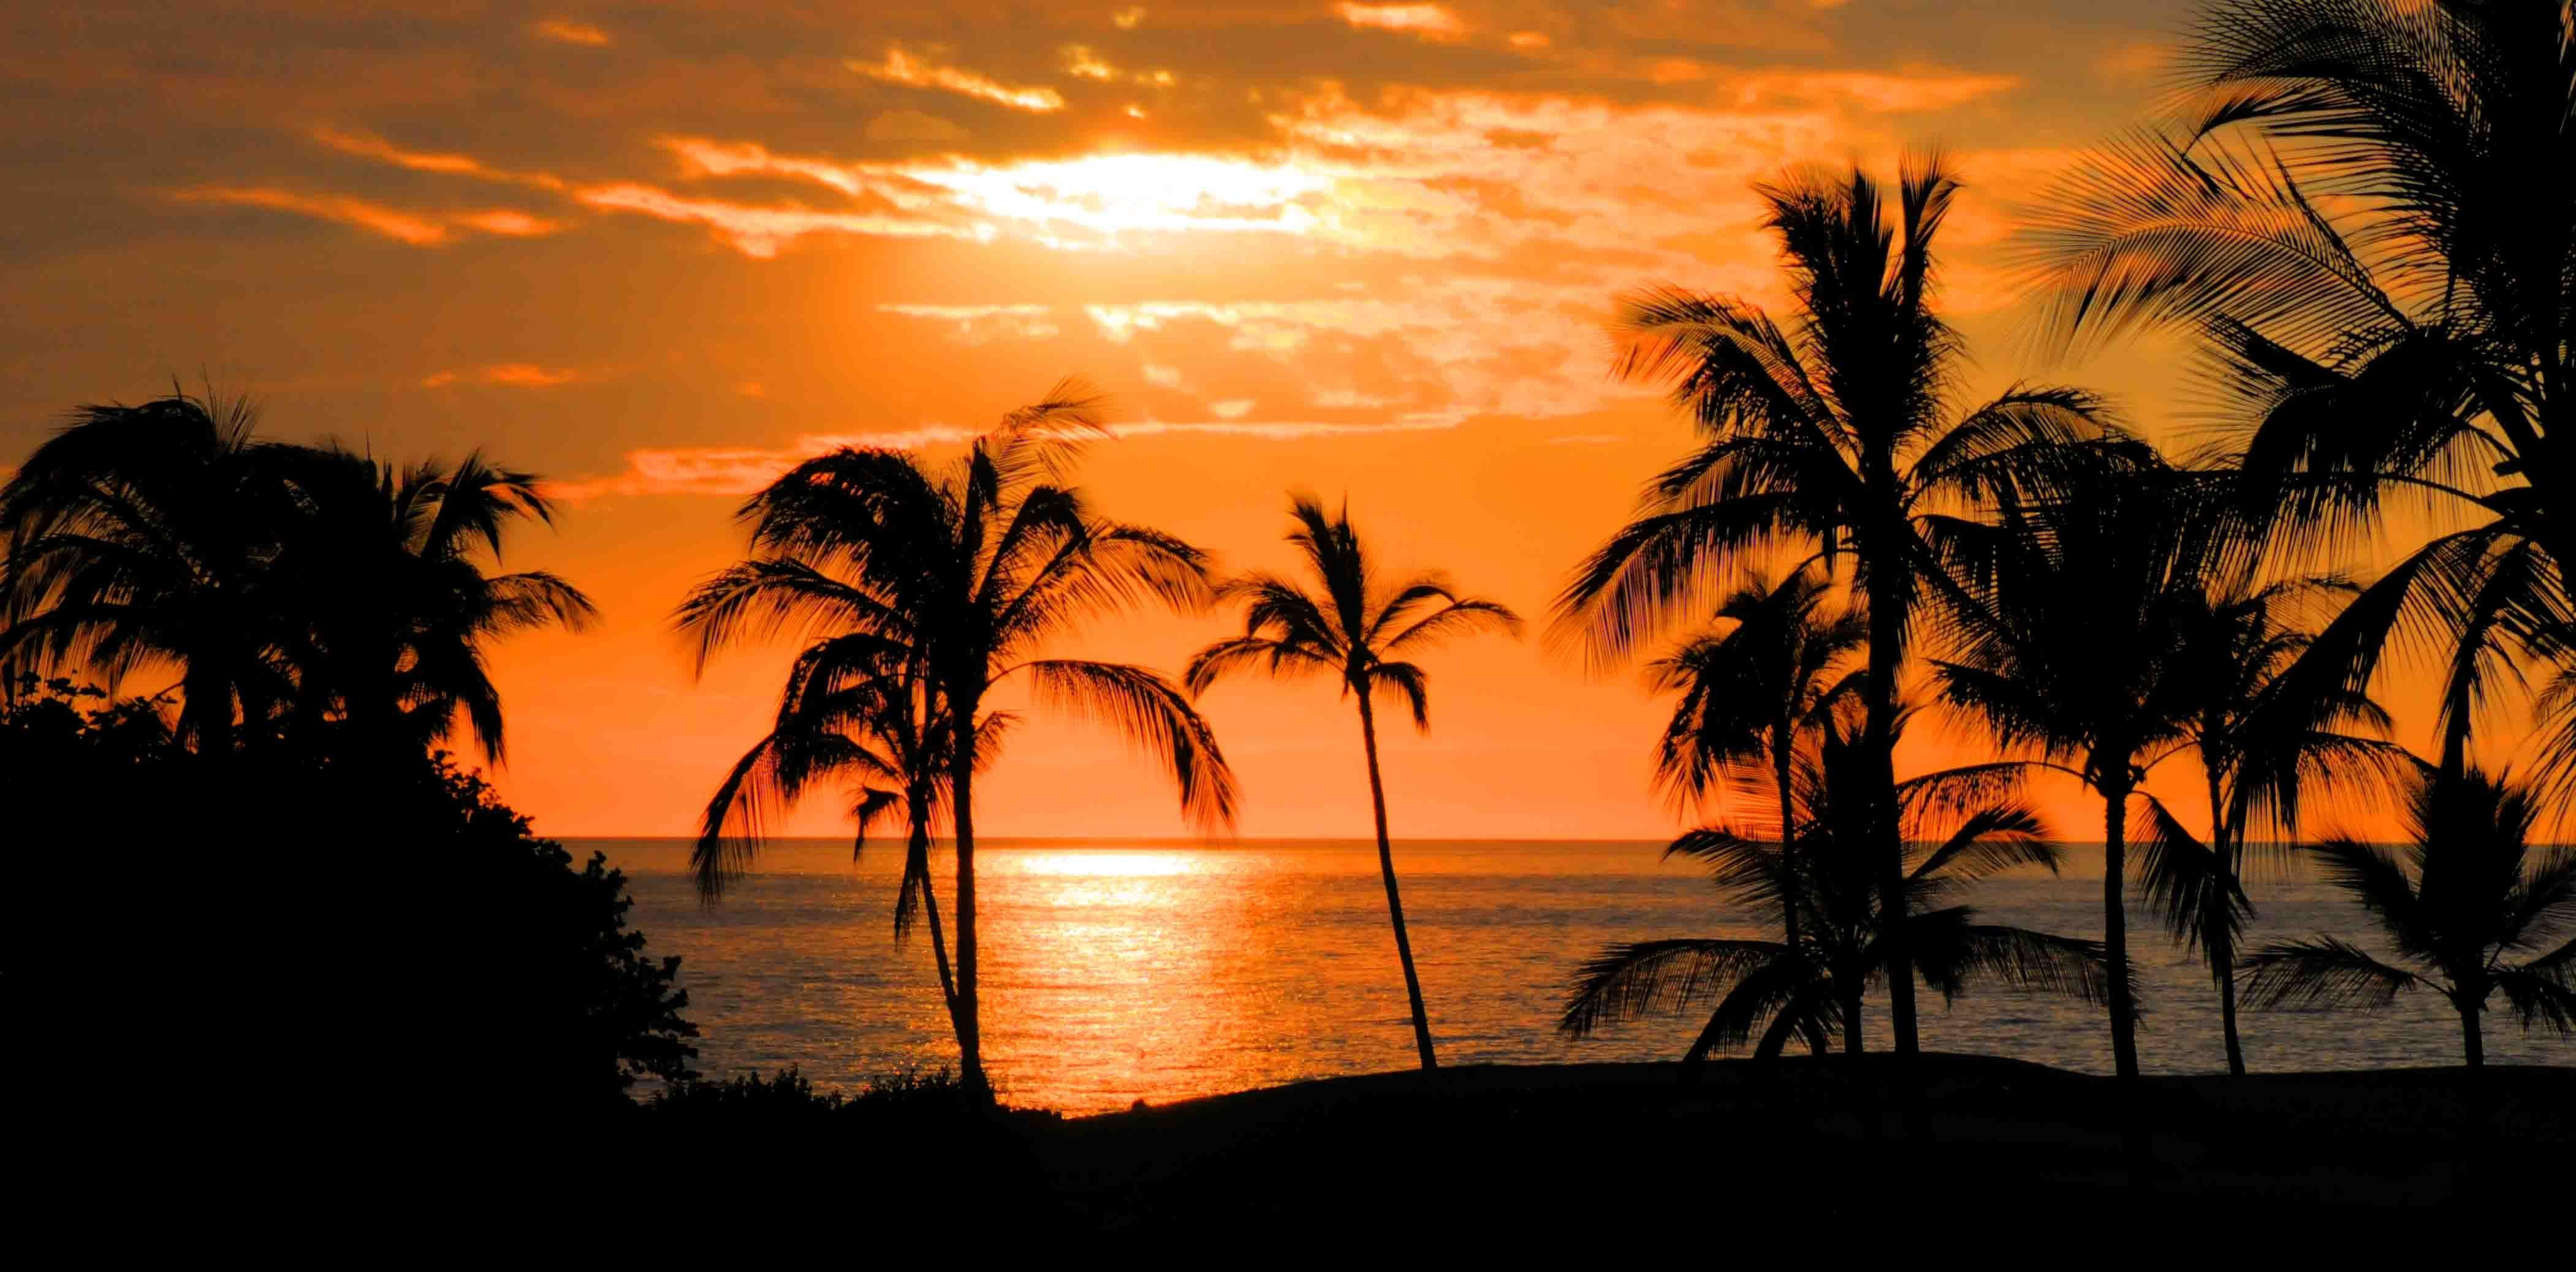 The florida keys key west my home state sunset sunset